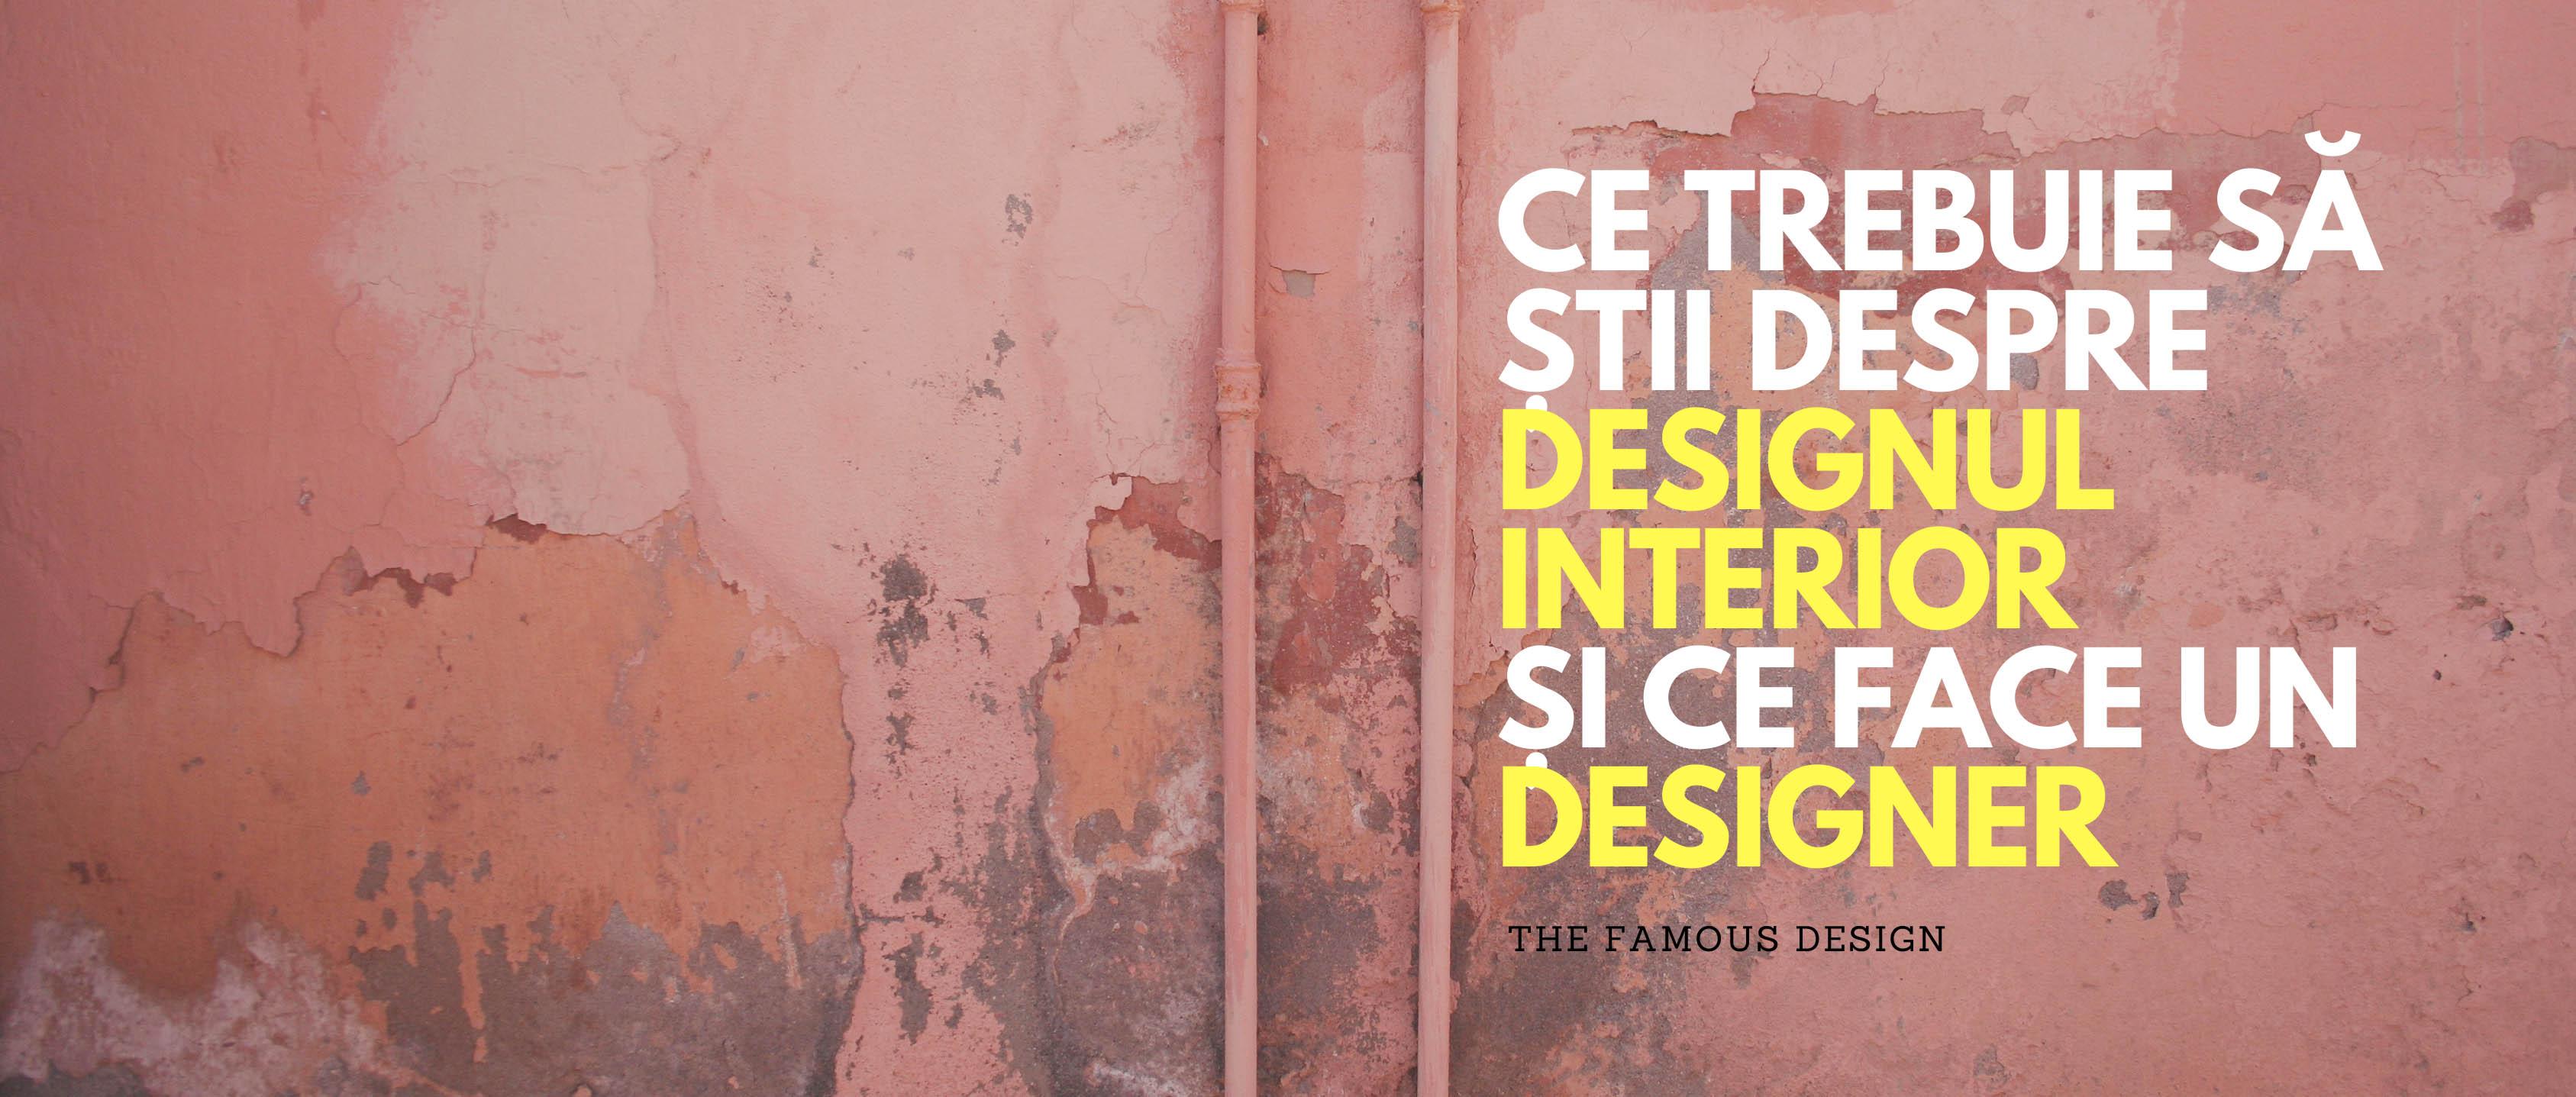 Ce Face Un Designer De Interior The Famous Design